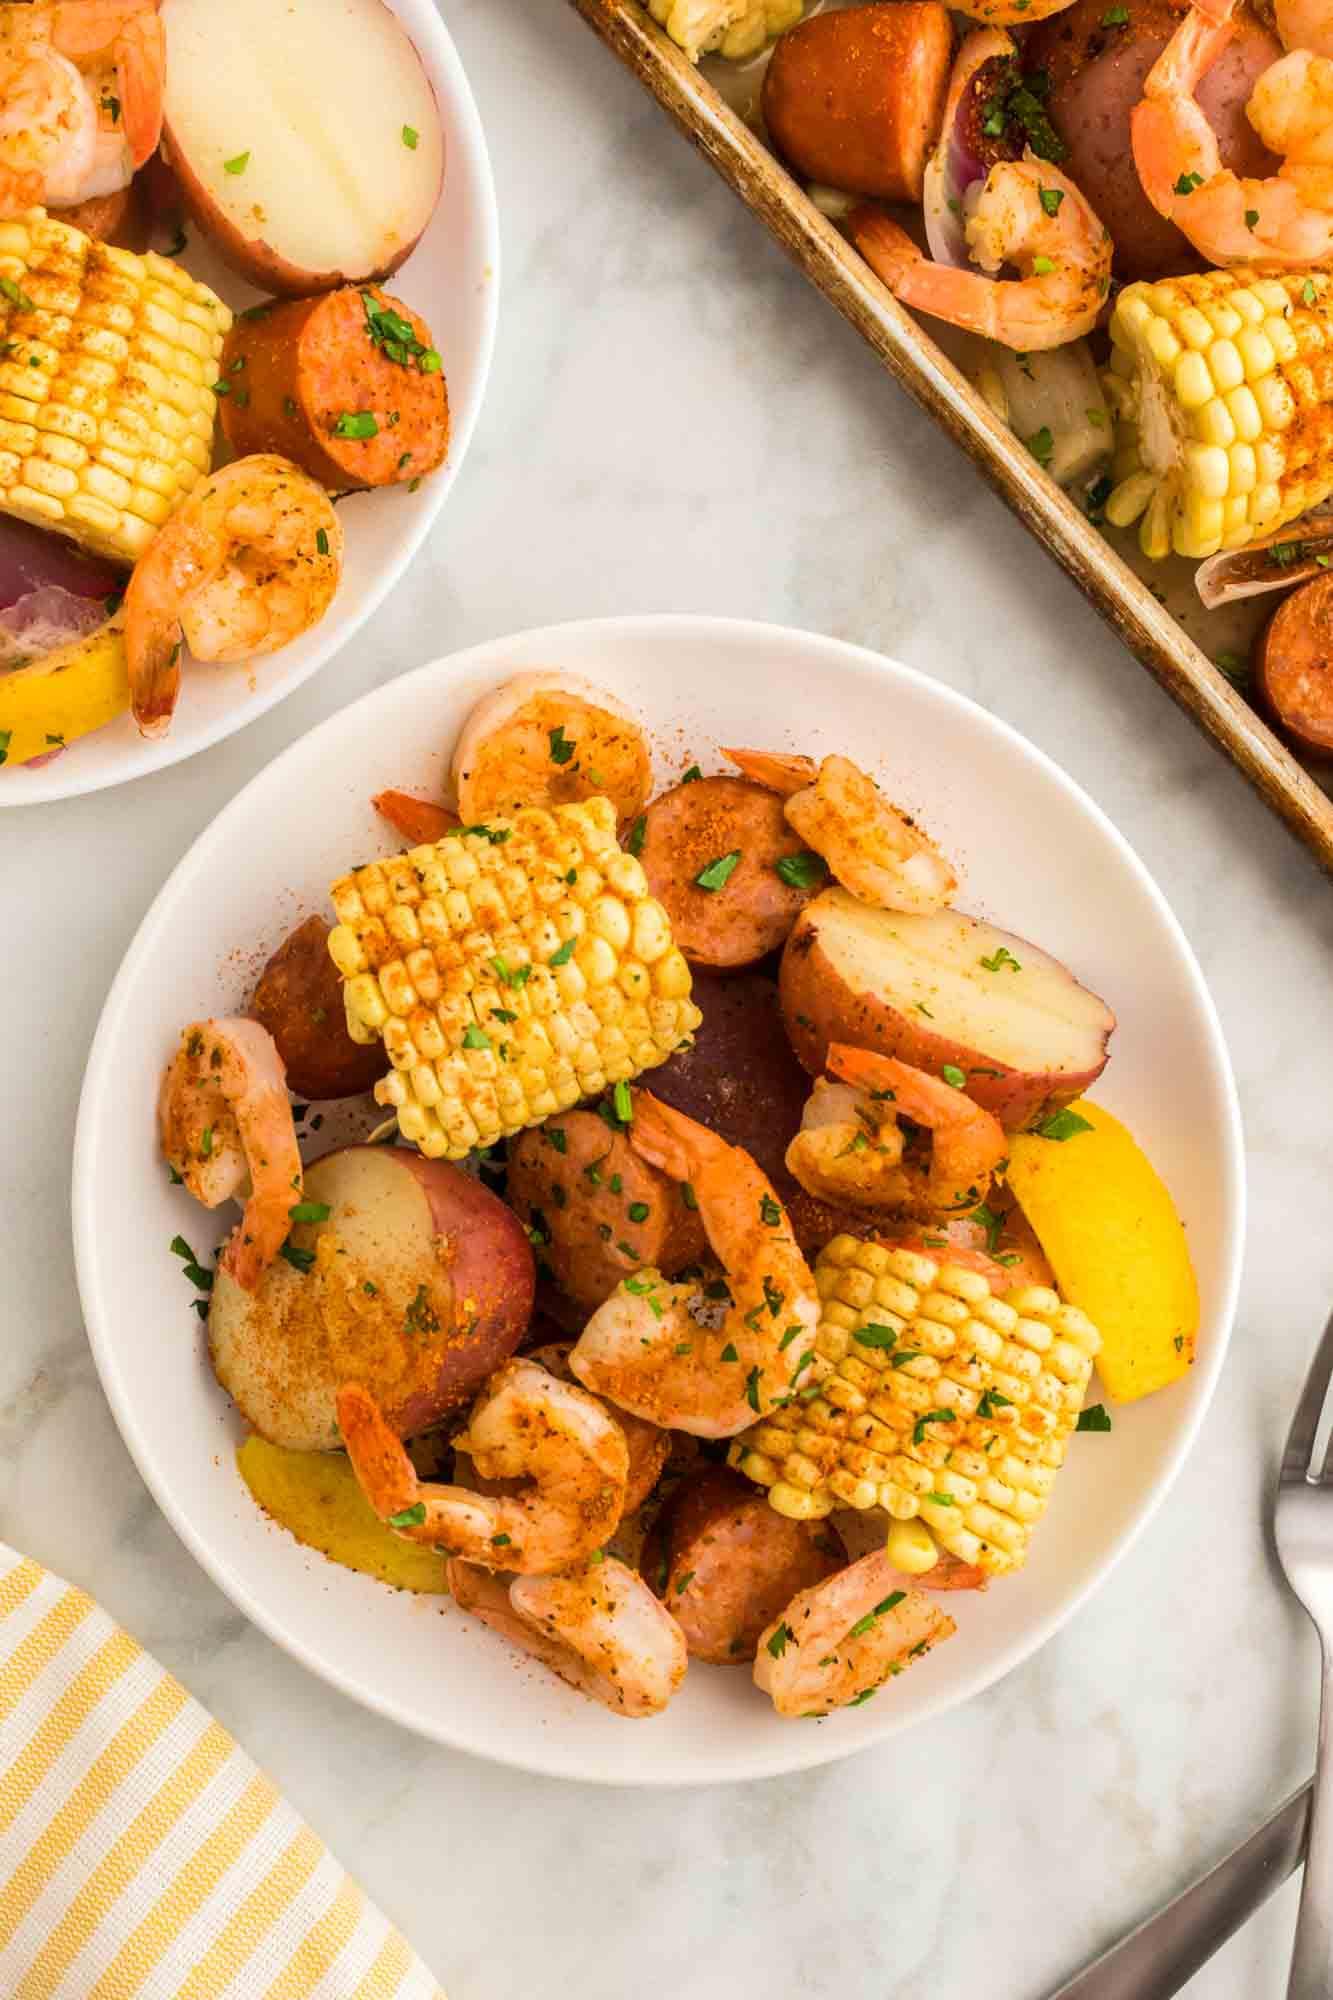 Shrimp boil served on white plates for individual servings